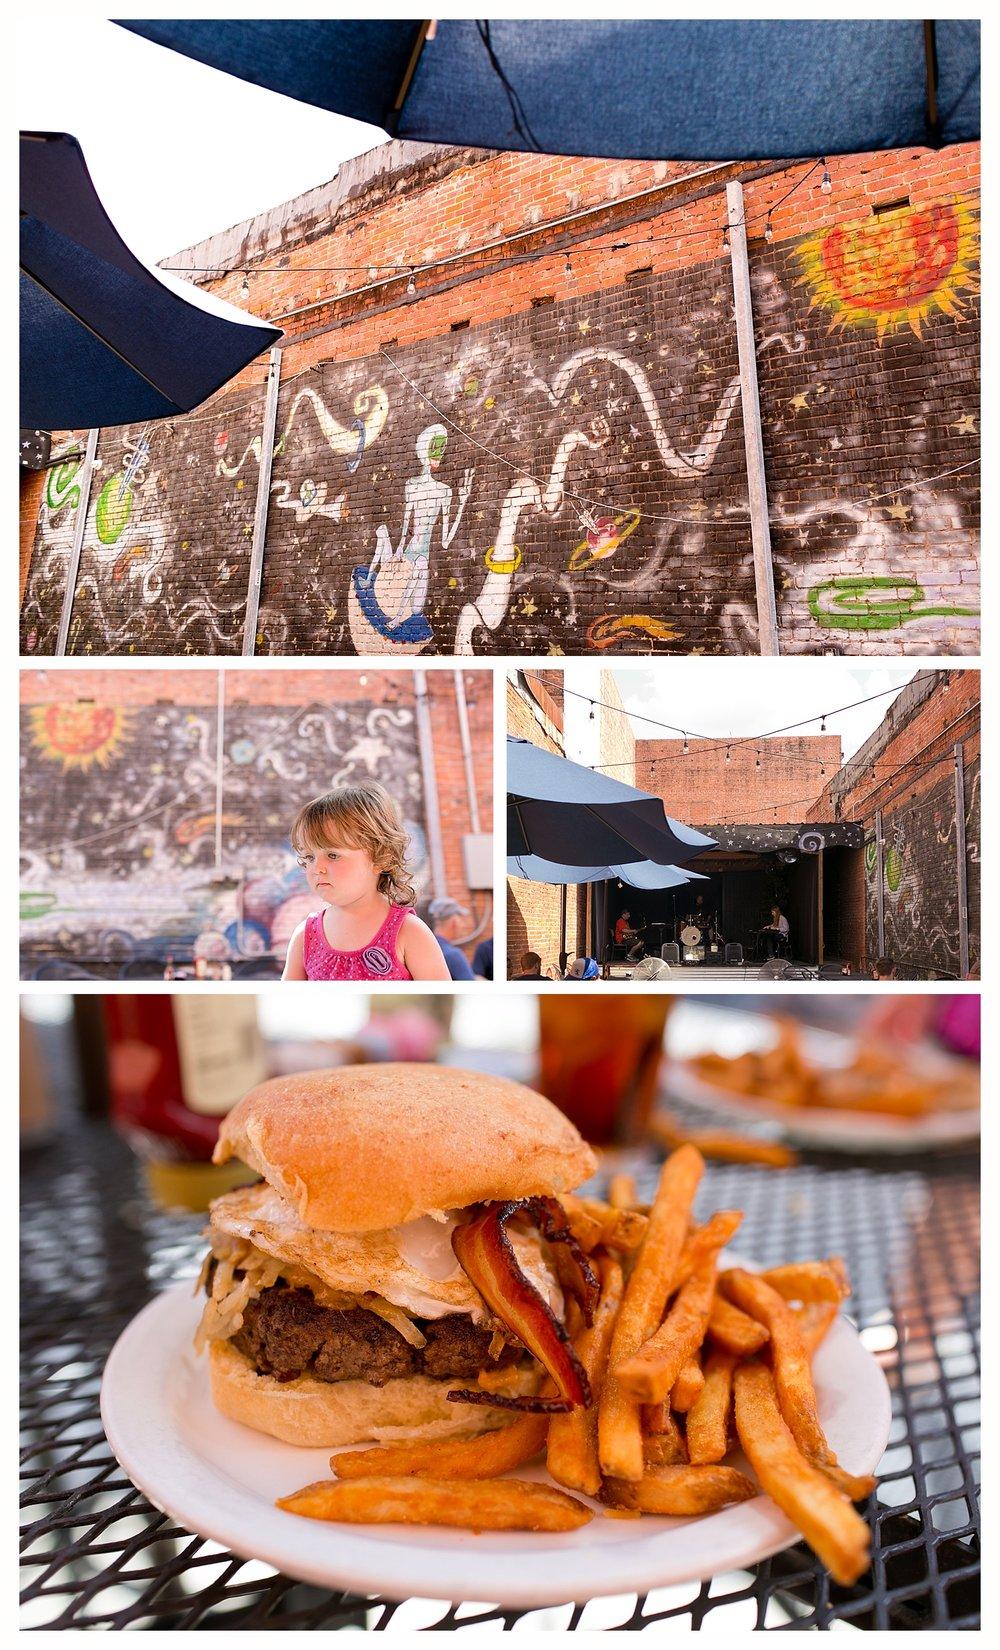 Luna Bar & Grill Sunday Jazz Brunch, Lake Charles, Louisiana restaurant